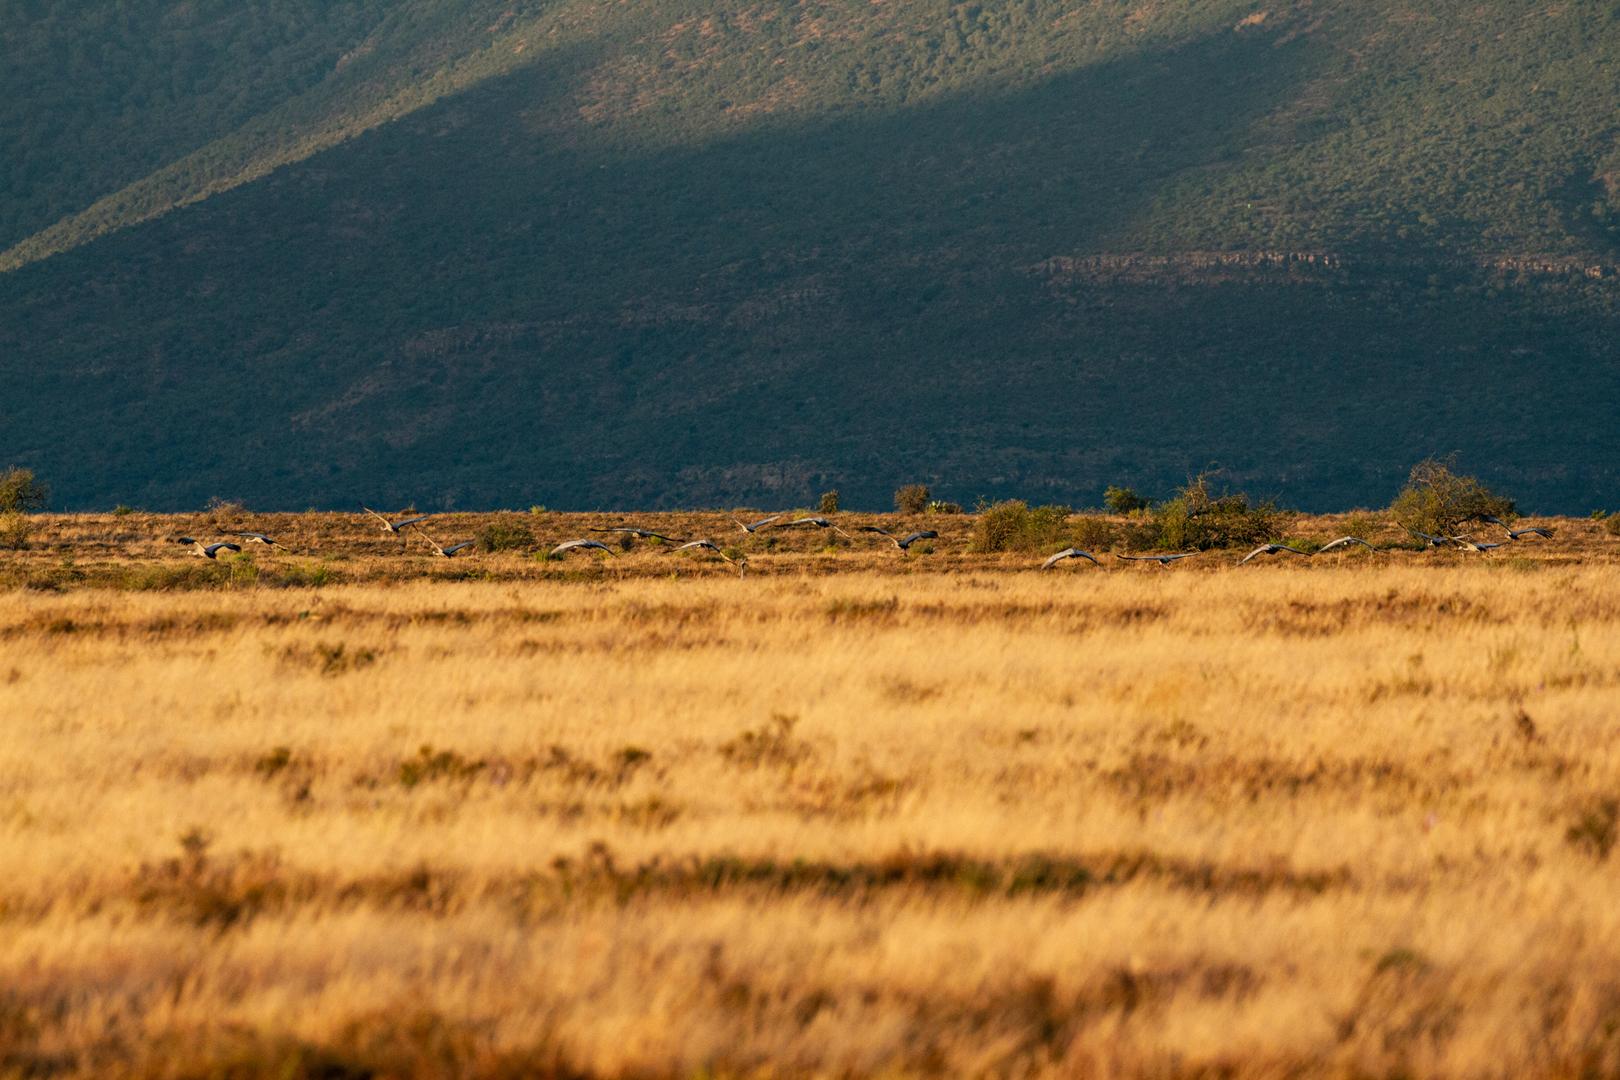 Landschaften43.jpg